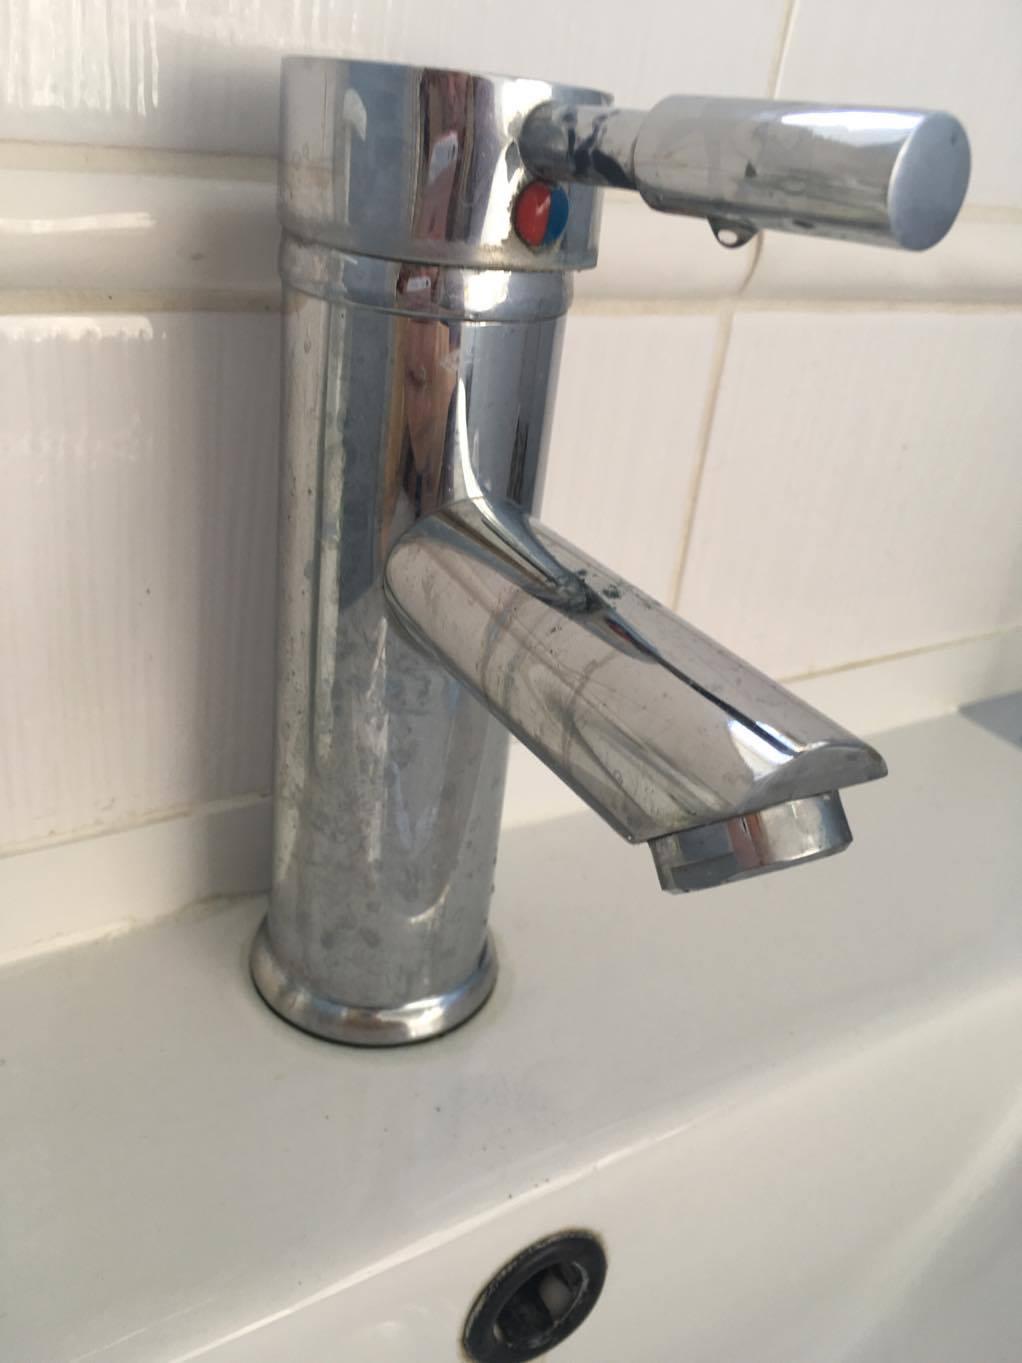 dirty tap